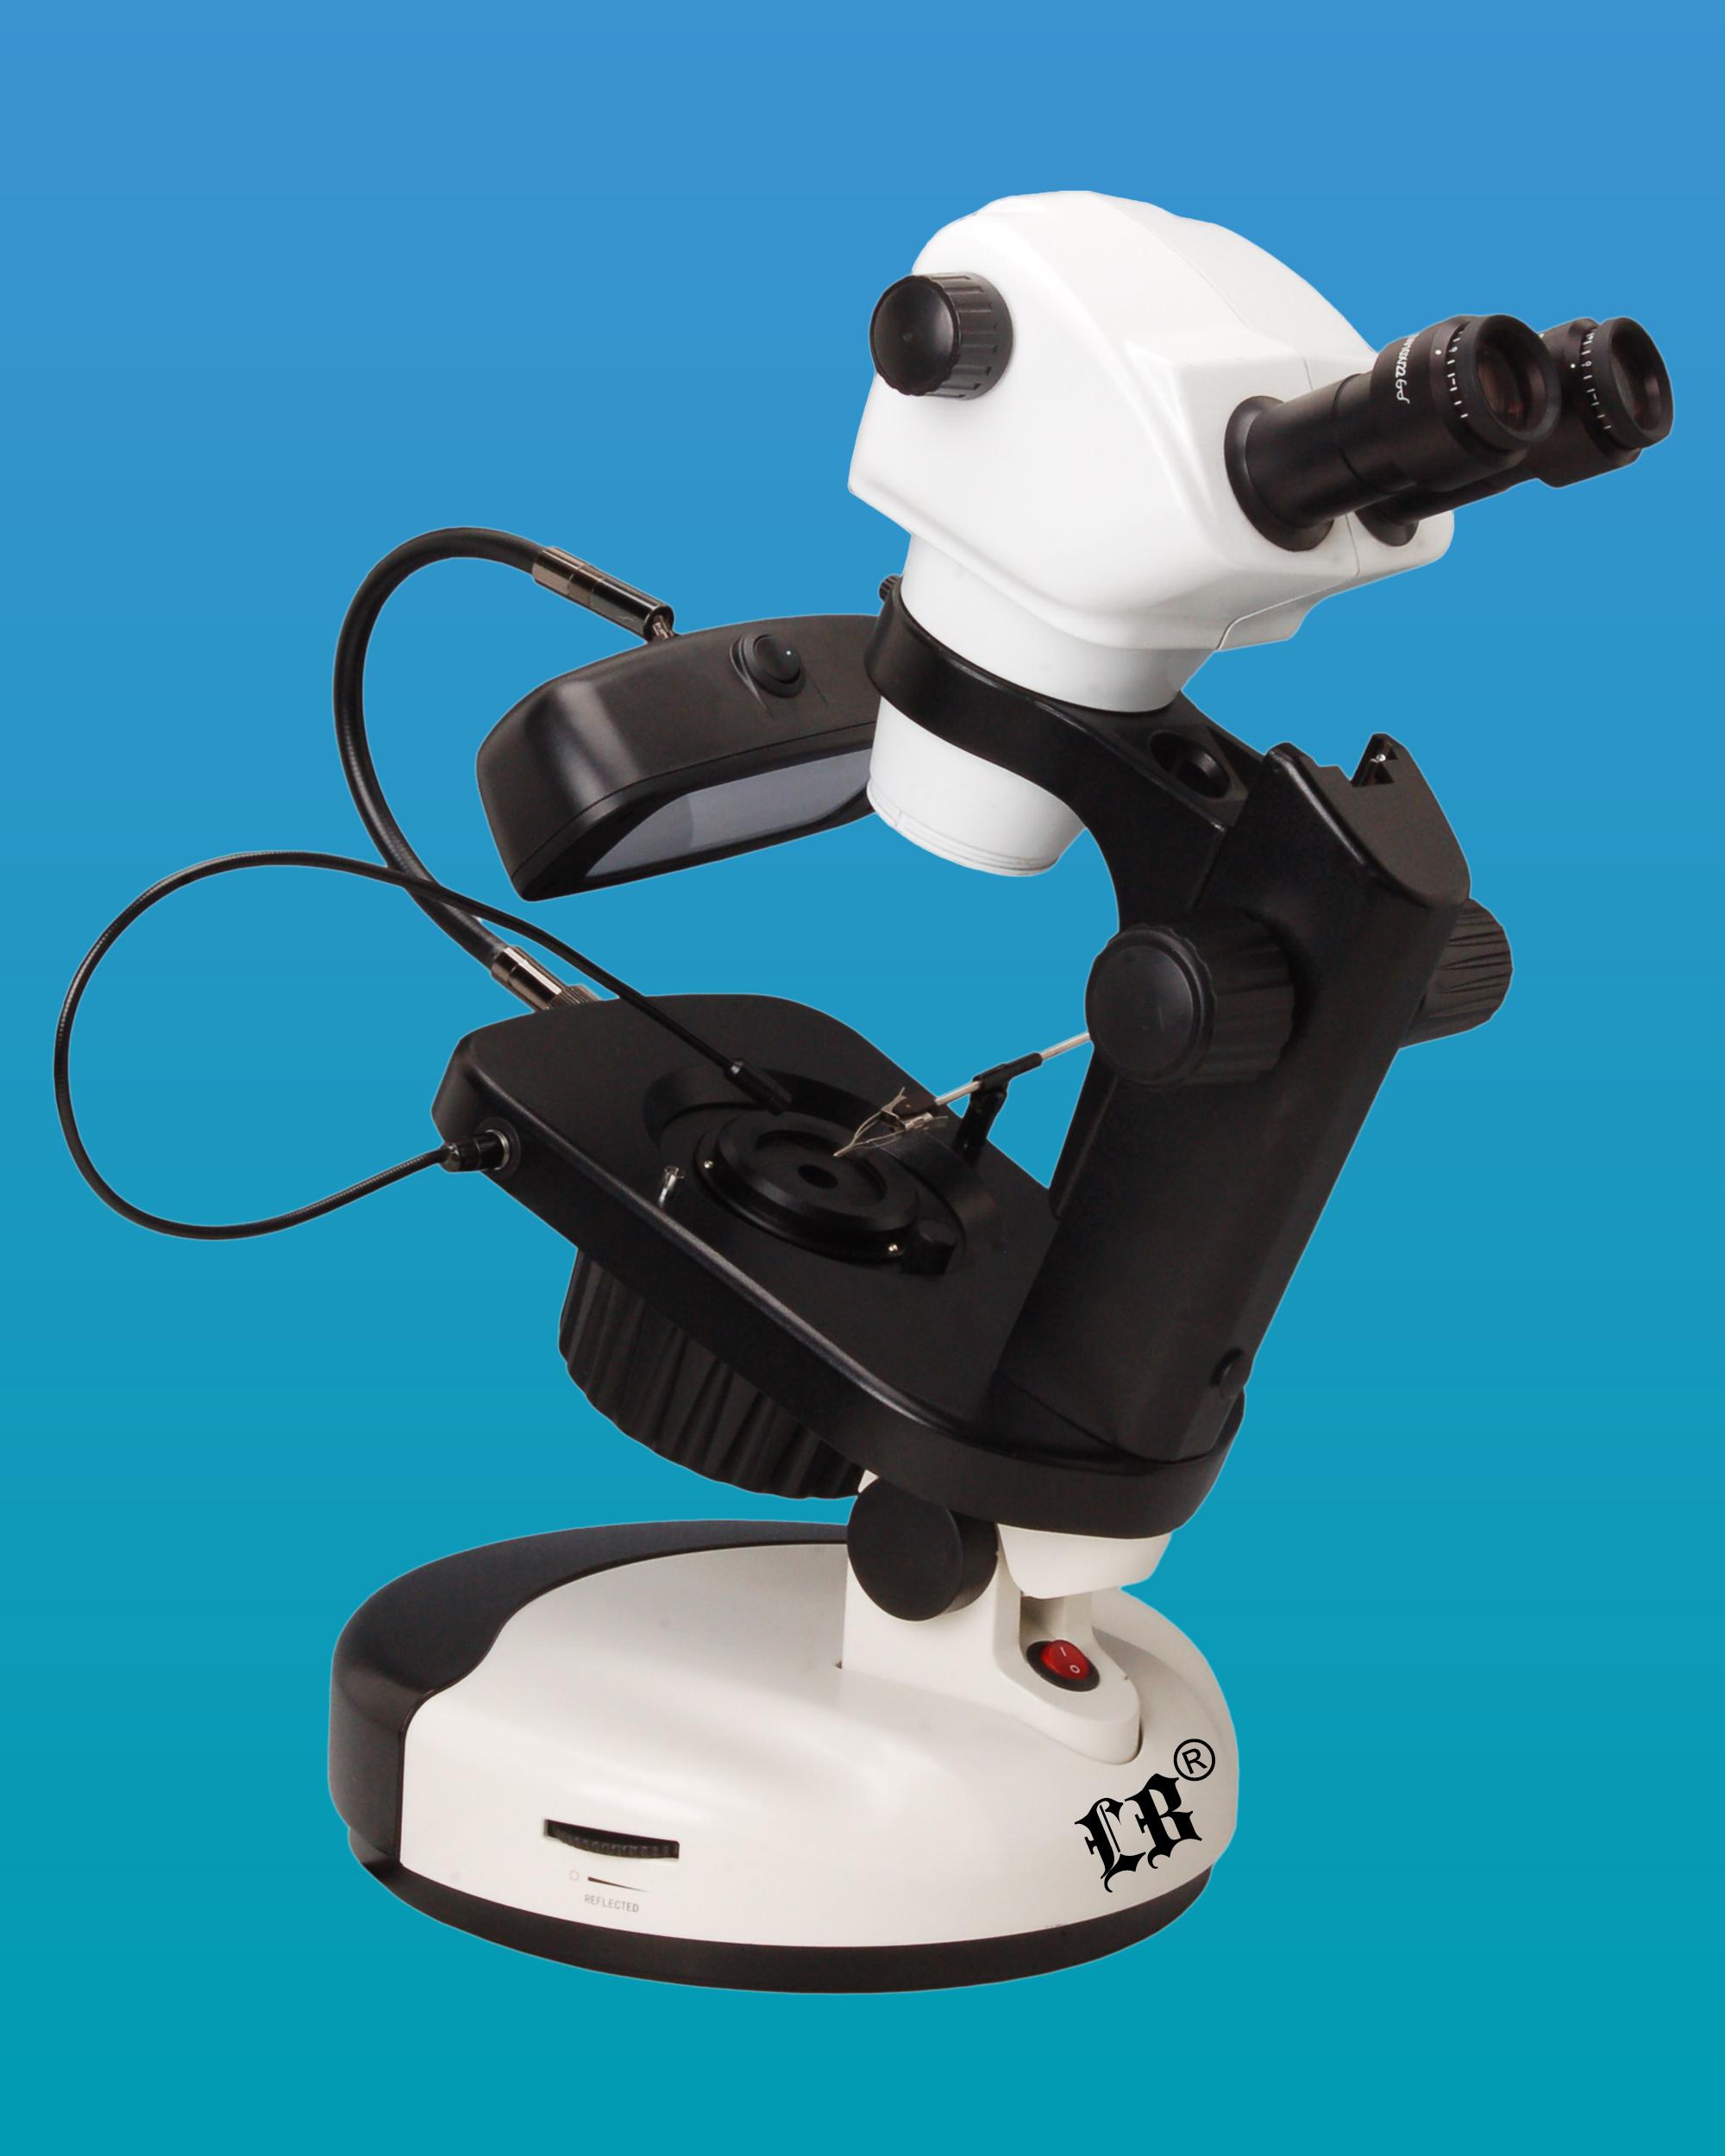 [LB-861] Trinocular Gemological Microscope